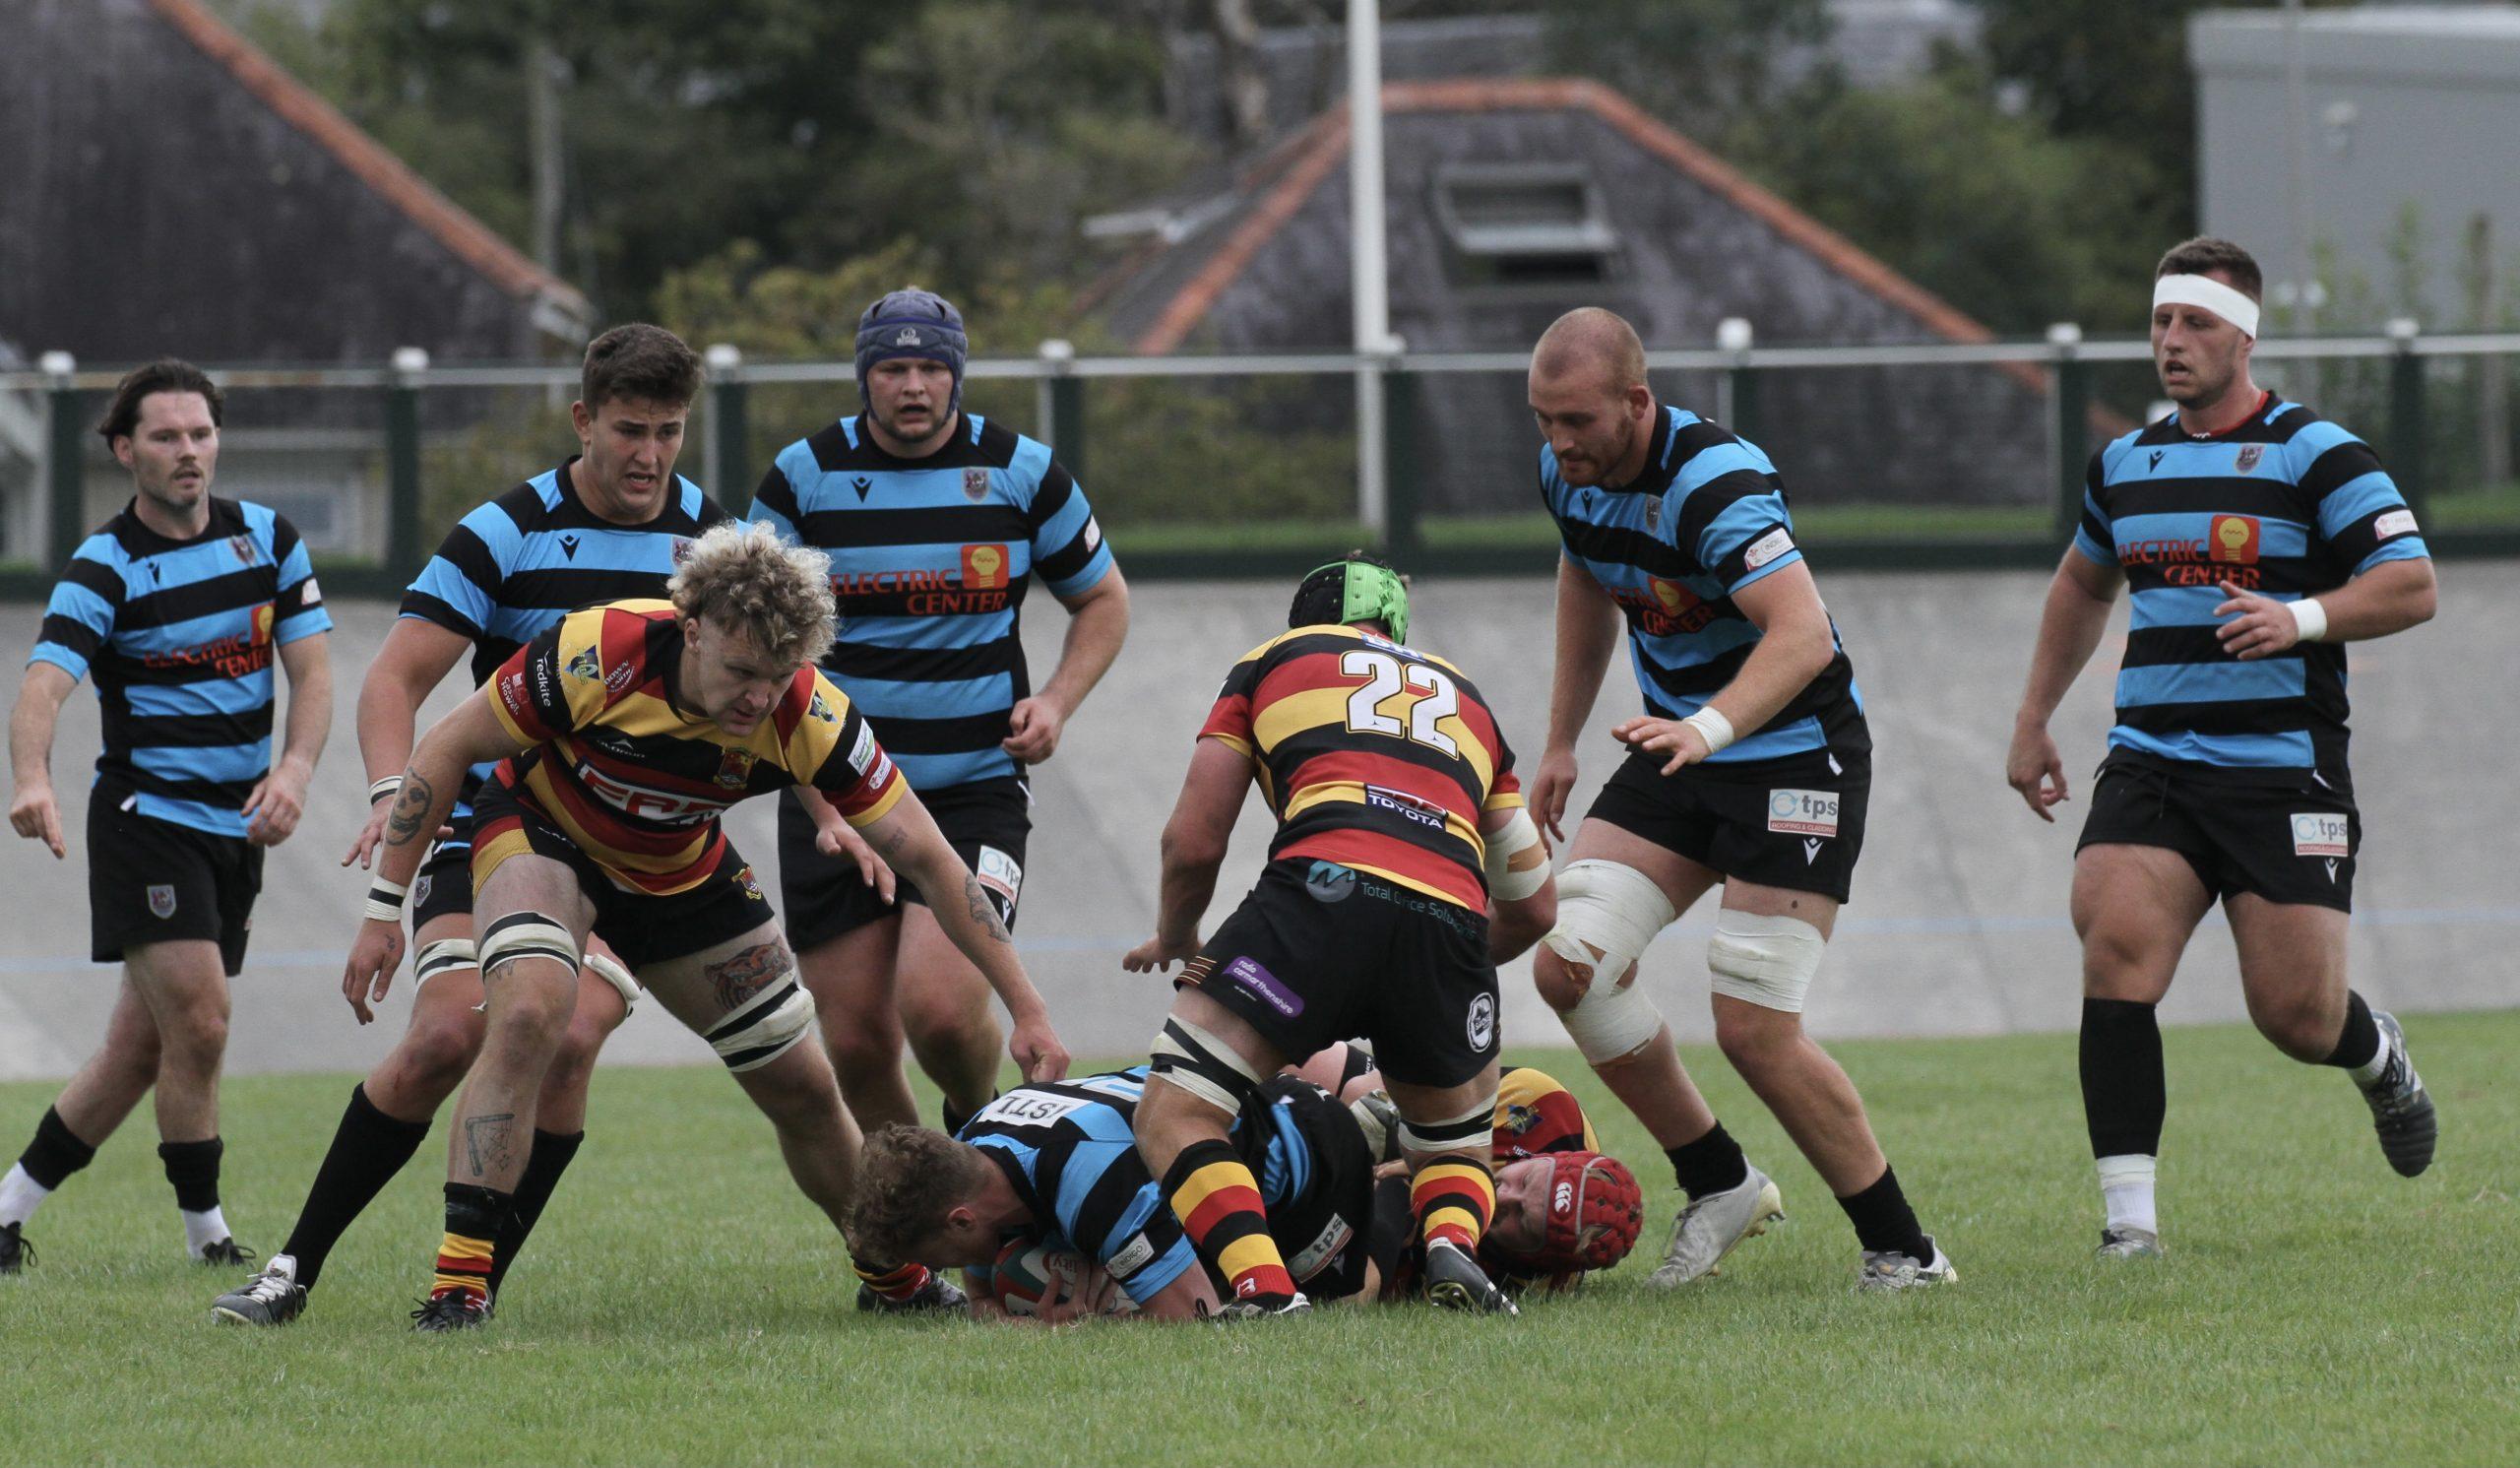 Carmarthen Quins 10 – Cardiff 13